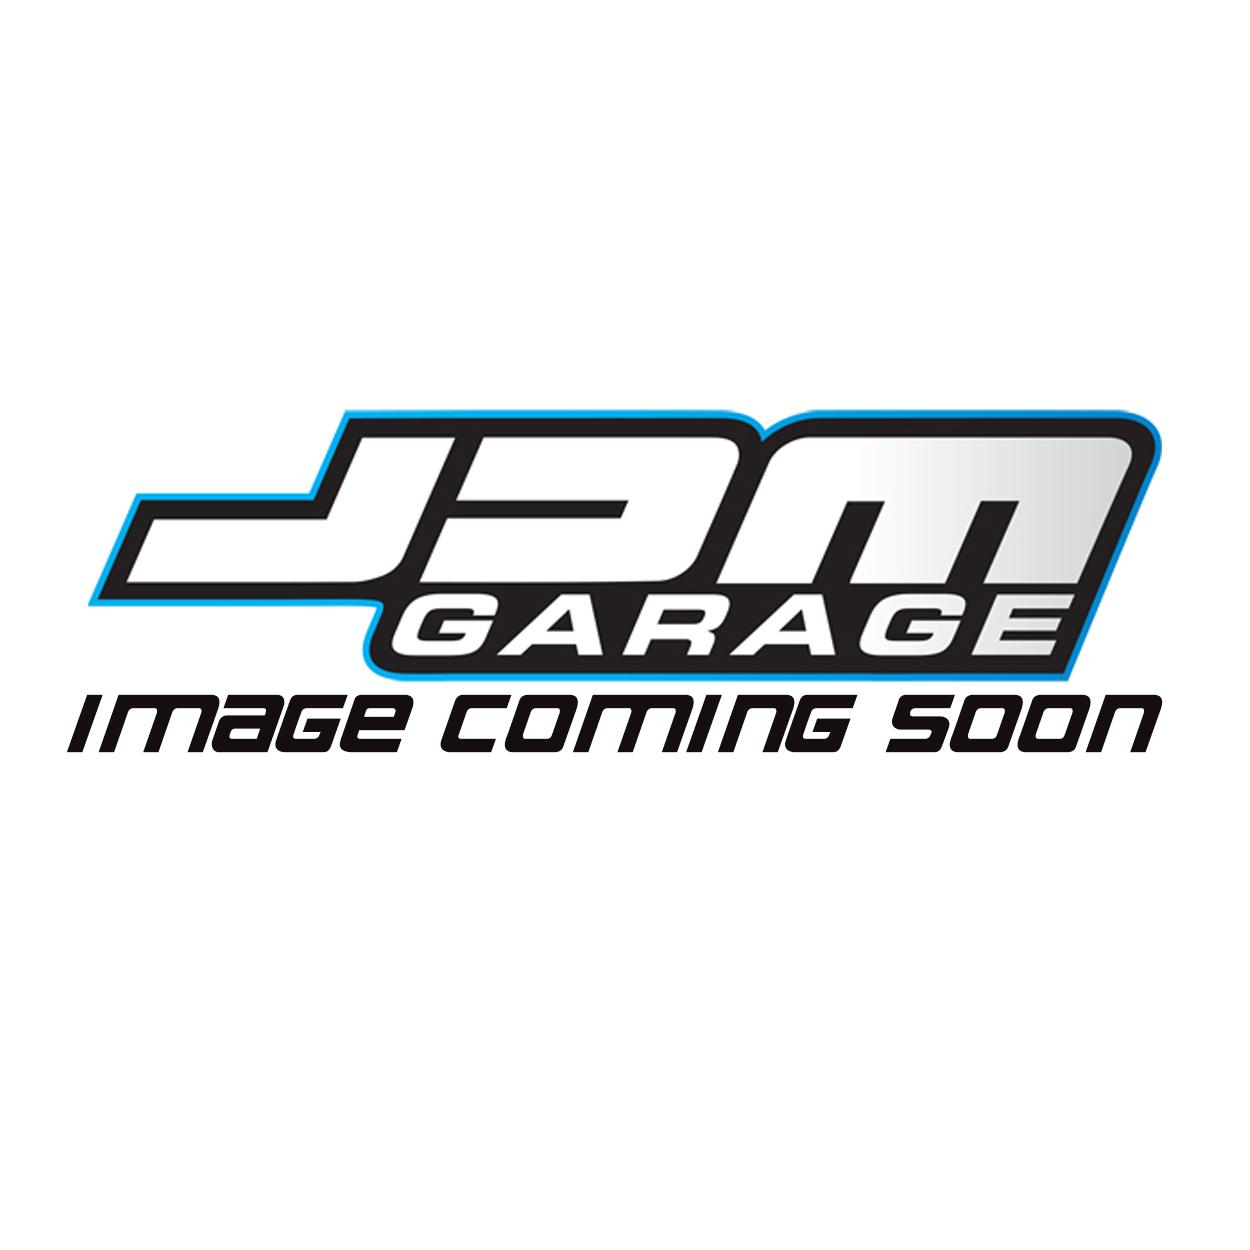 Mishimoto Performance Aluminium Radiators - Toyota Celica GT4 / Corolla / AE86 / Supra / MR2 MRS